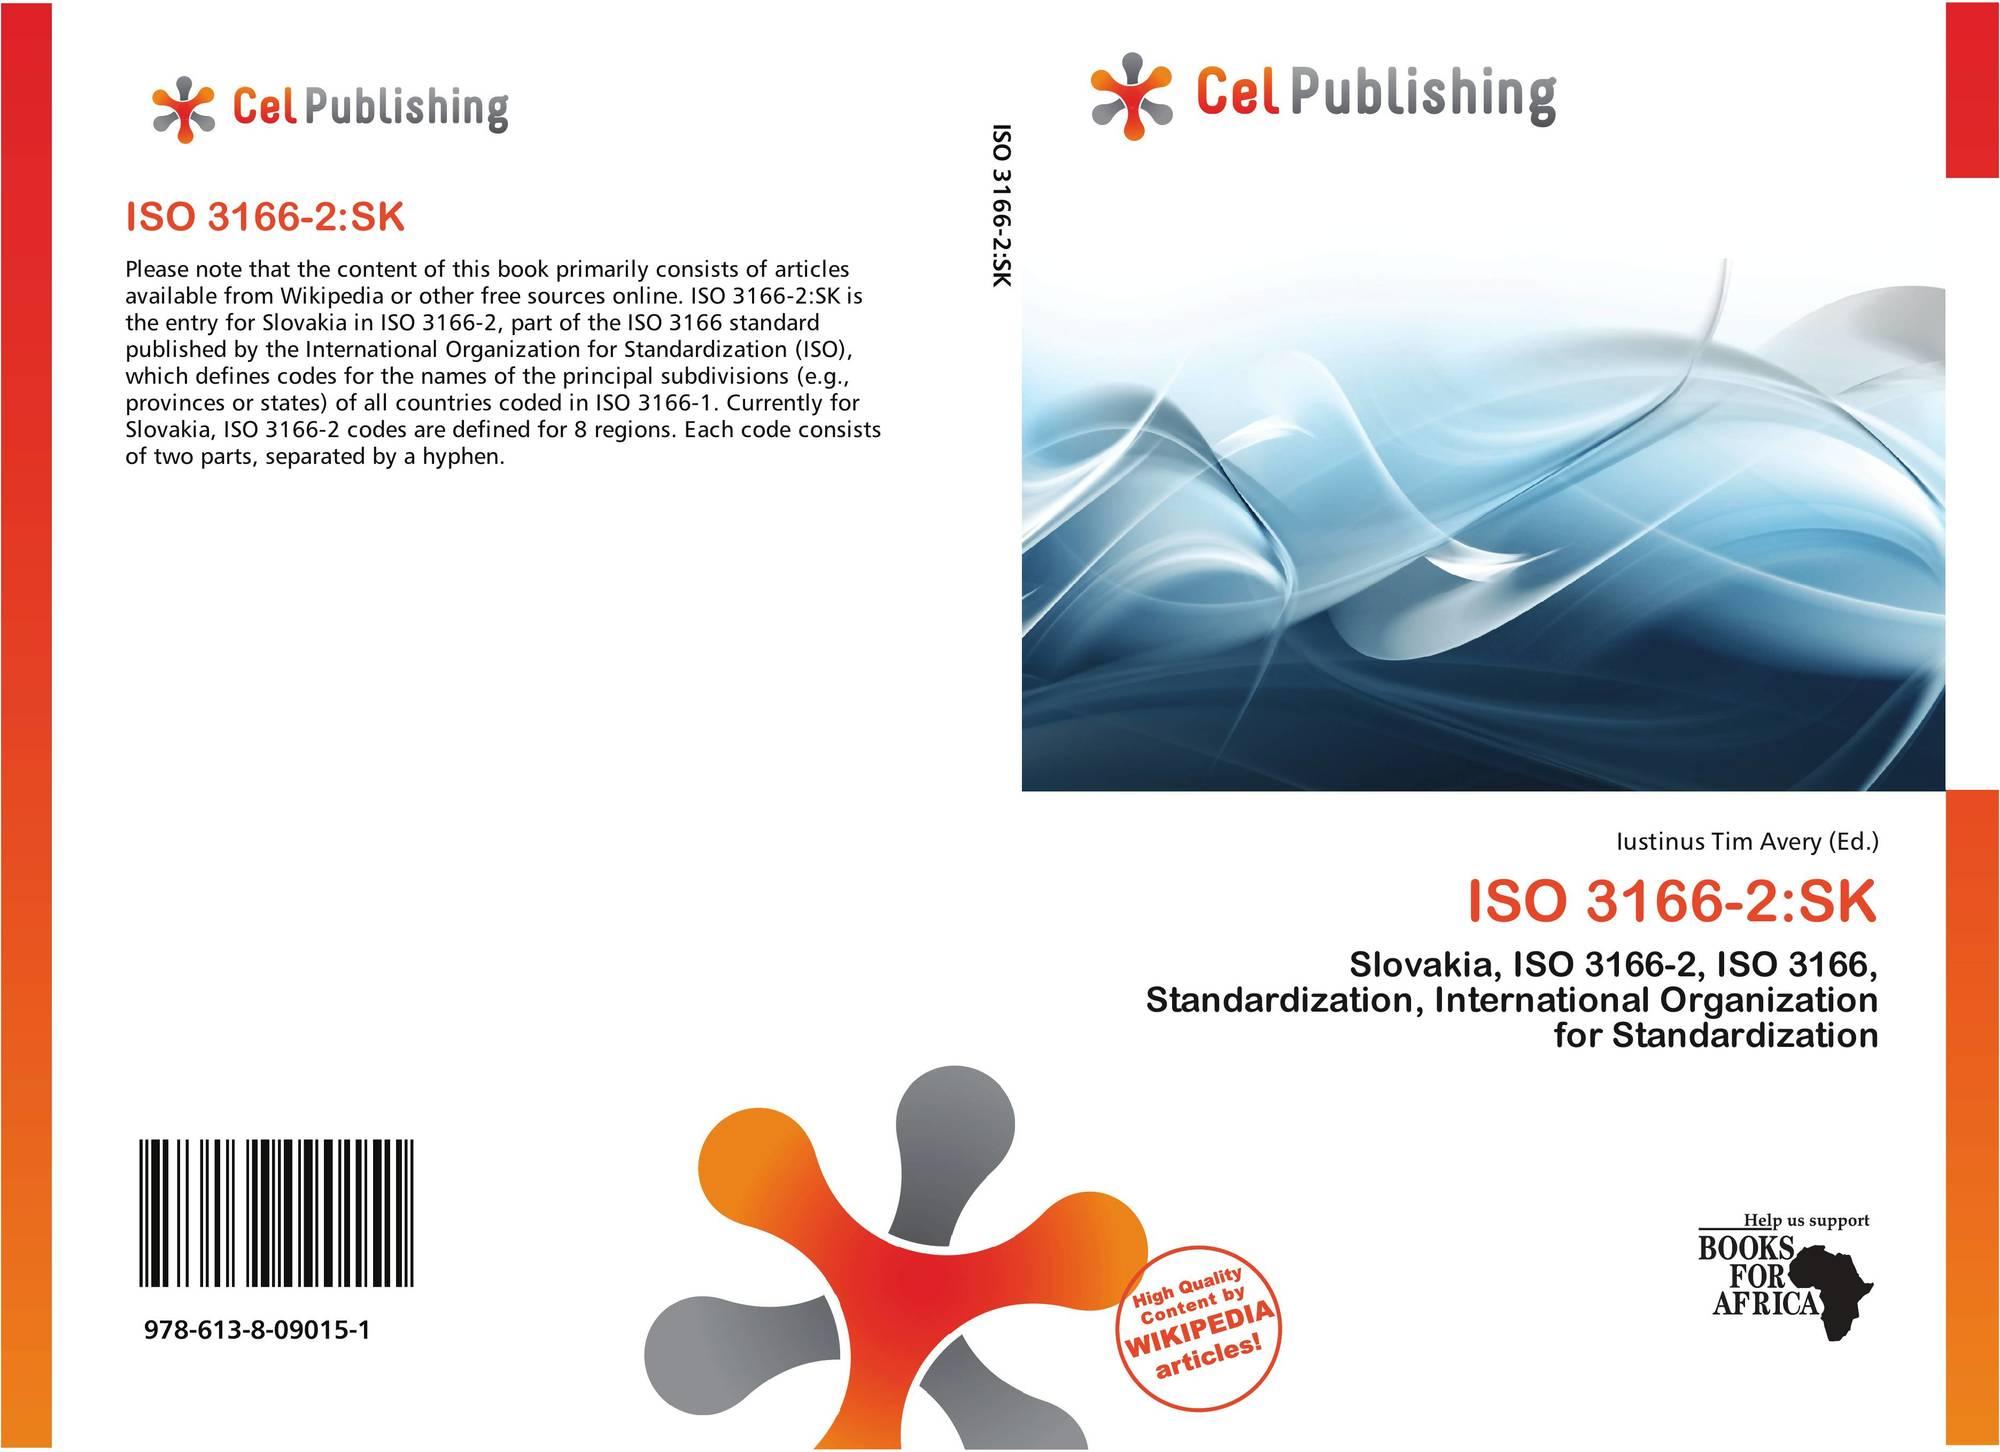 ISO 3166-2:SK, 978-613-8-09015...